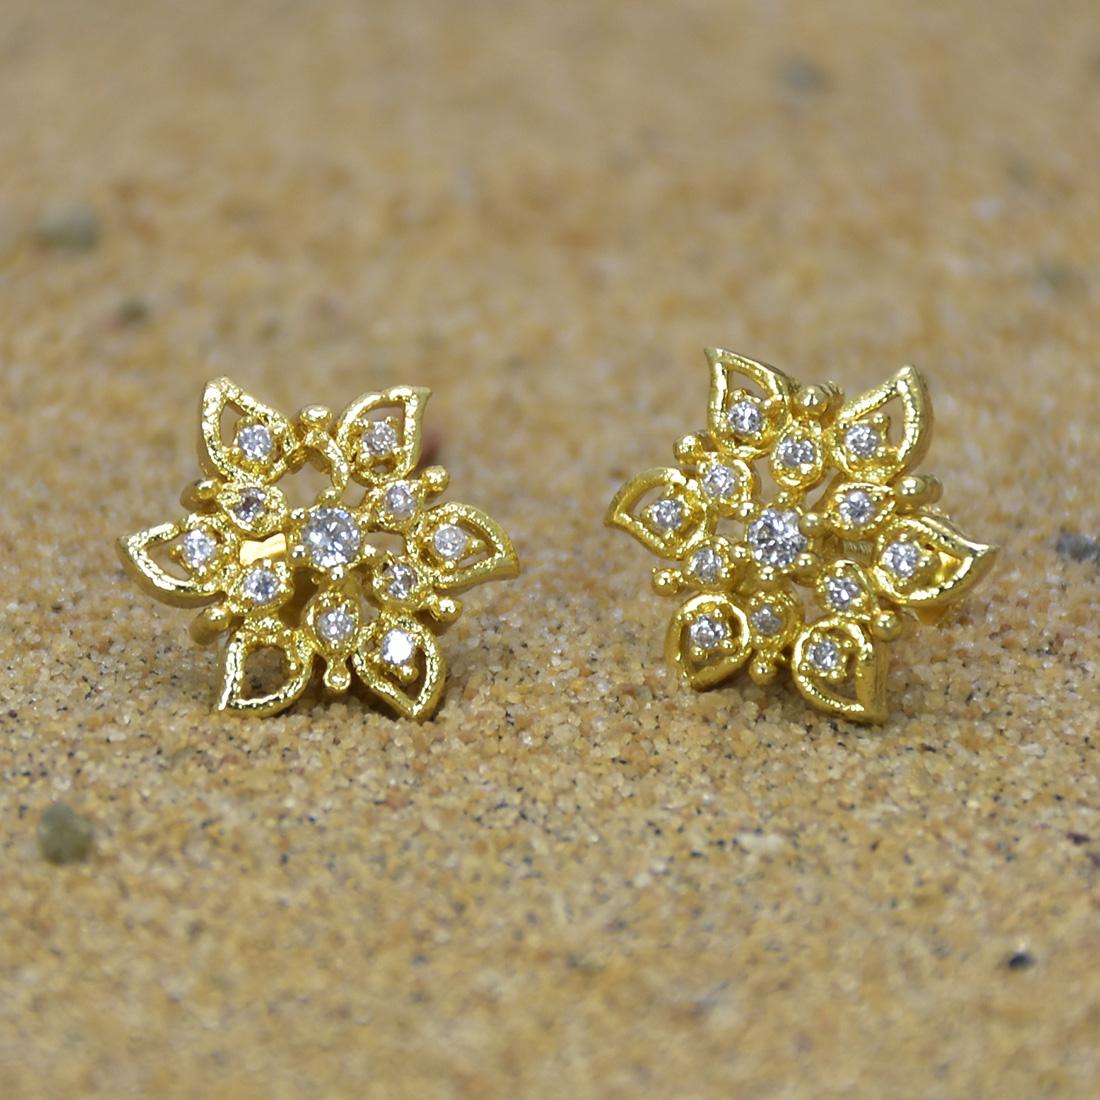 9a65b07b9cc62 Kollam Supreme Premium Fashion Jewellery: Daily Wear Semiprecious ...